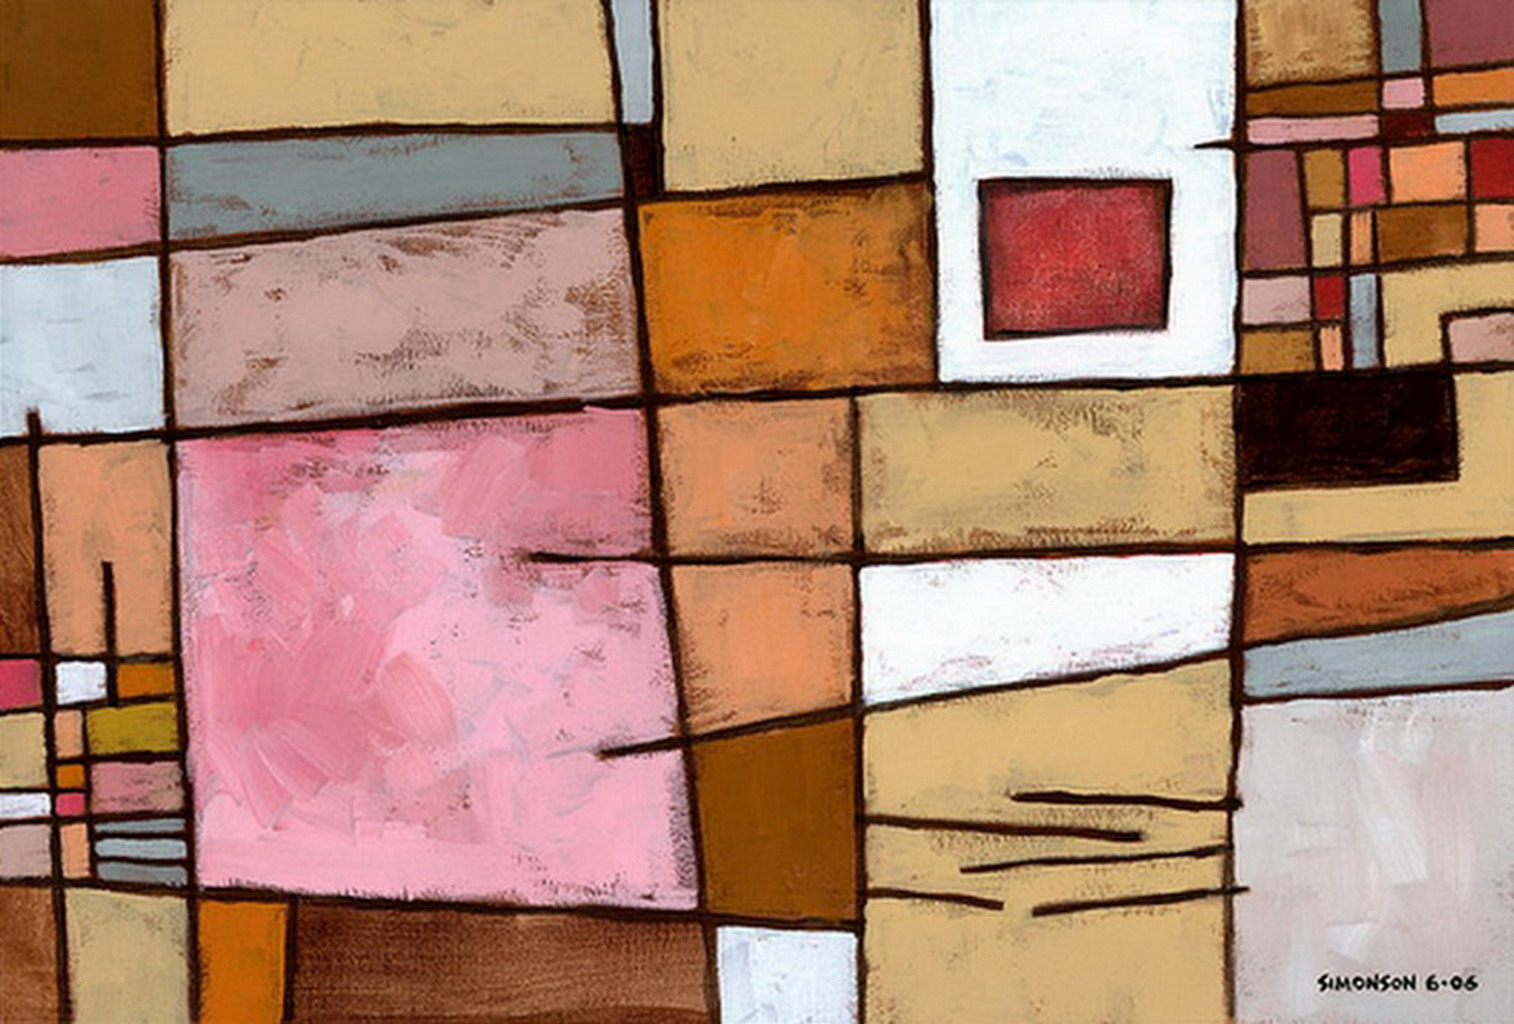 Pintura moderna y fotograf a art stica pintores de - Fotos cuadros abstractos ...